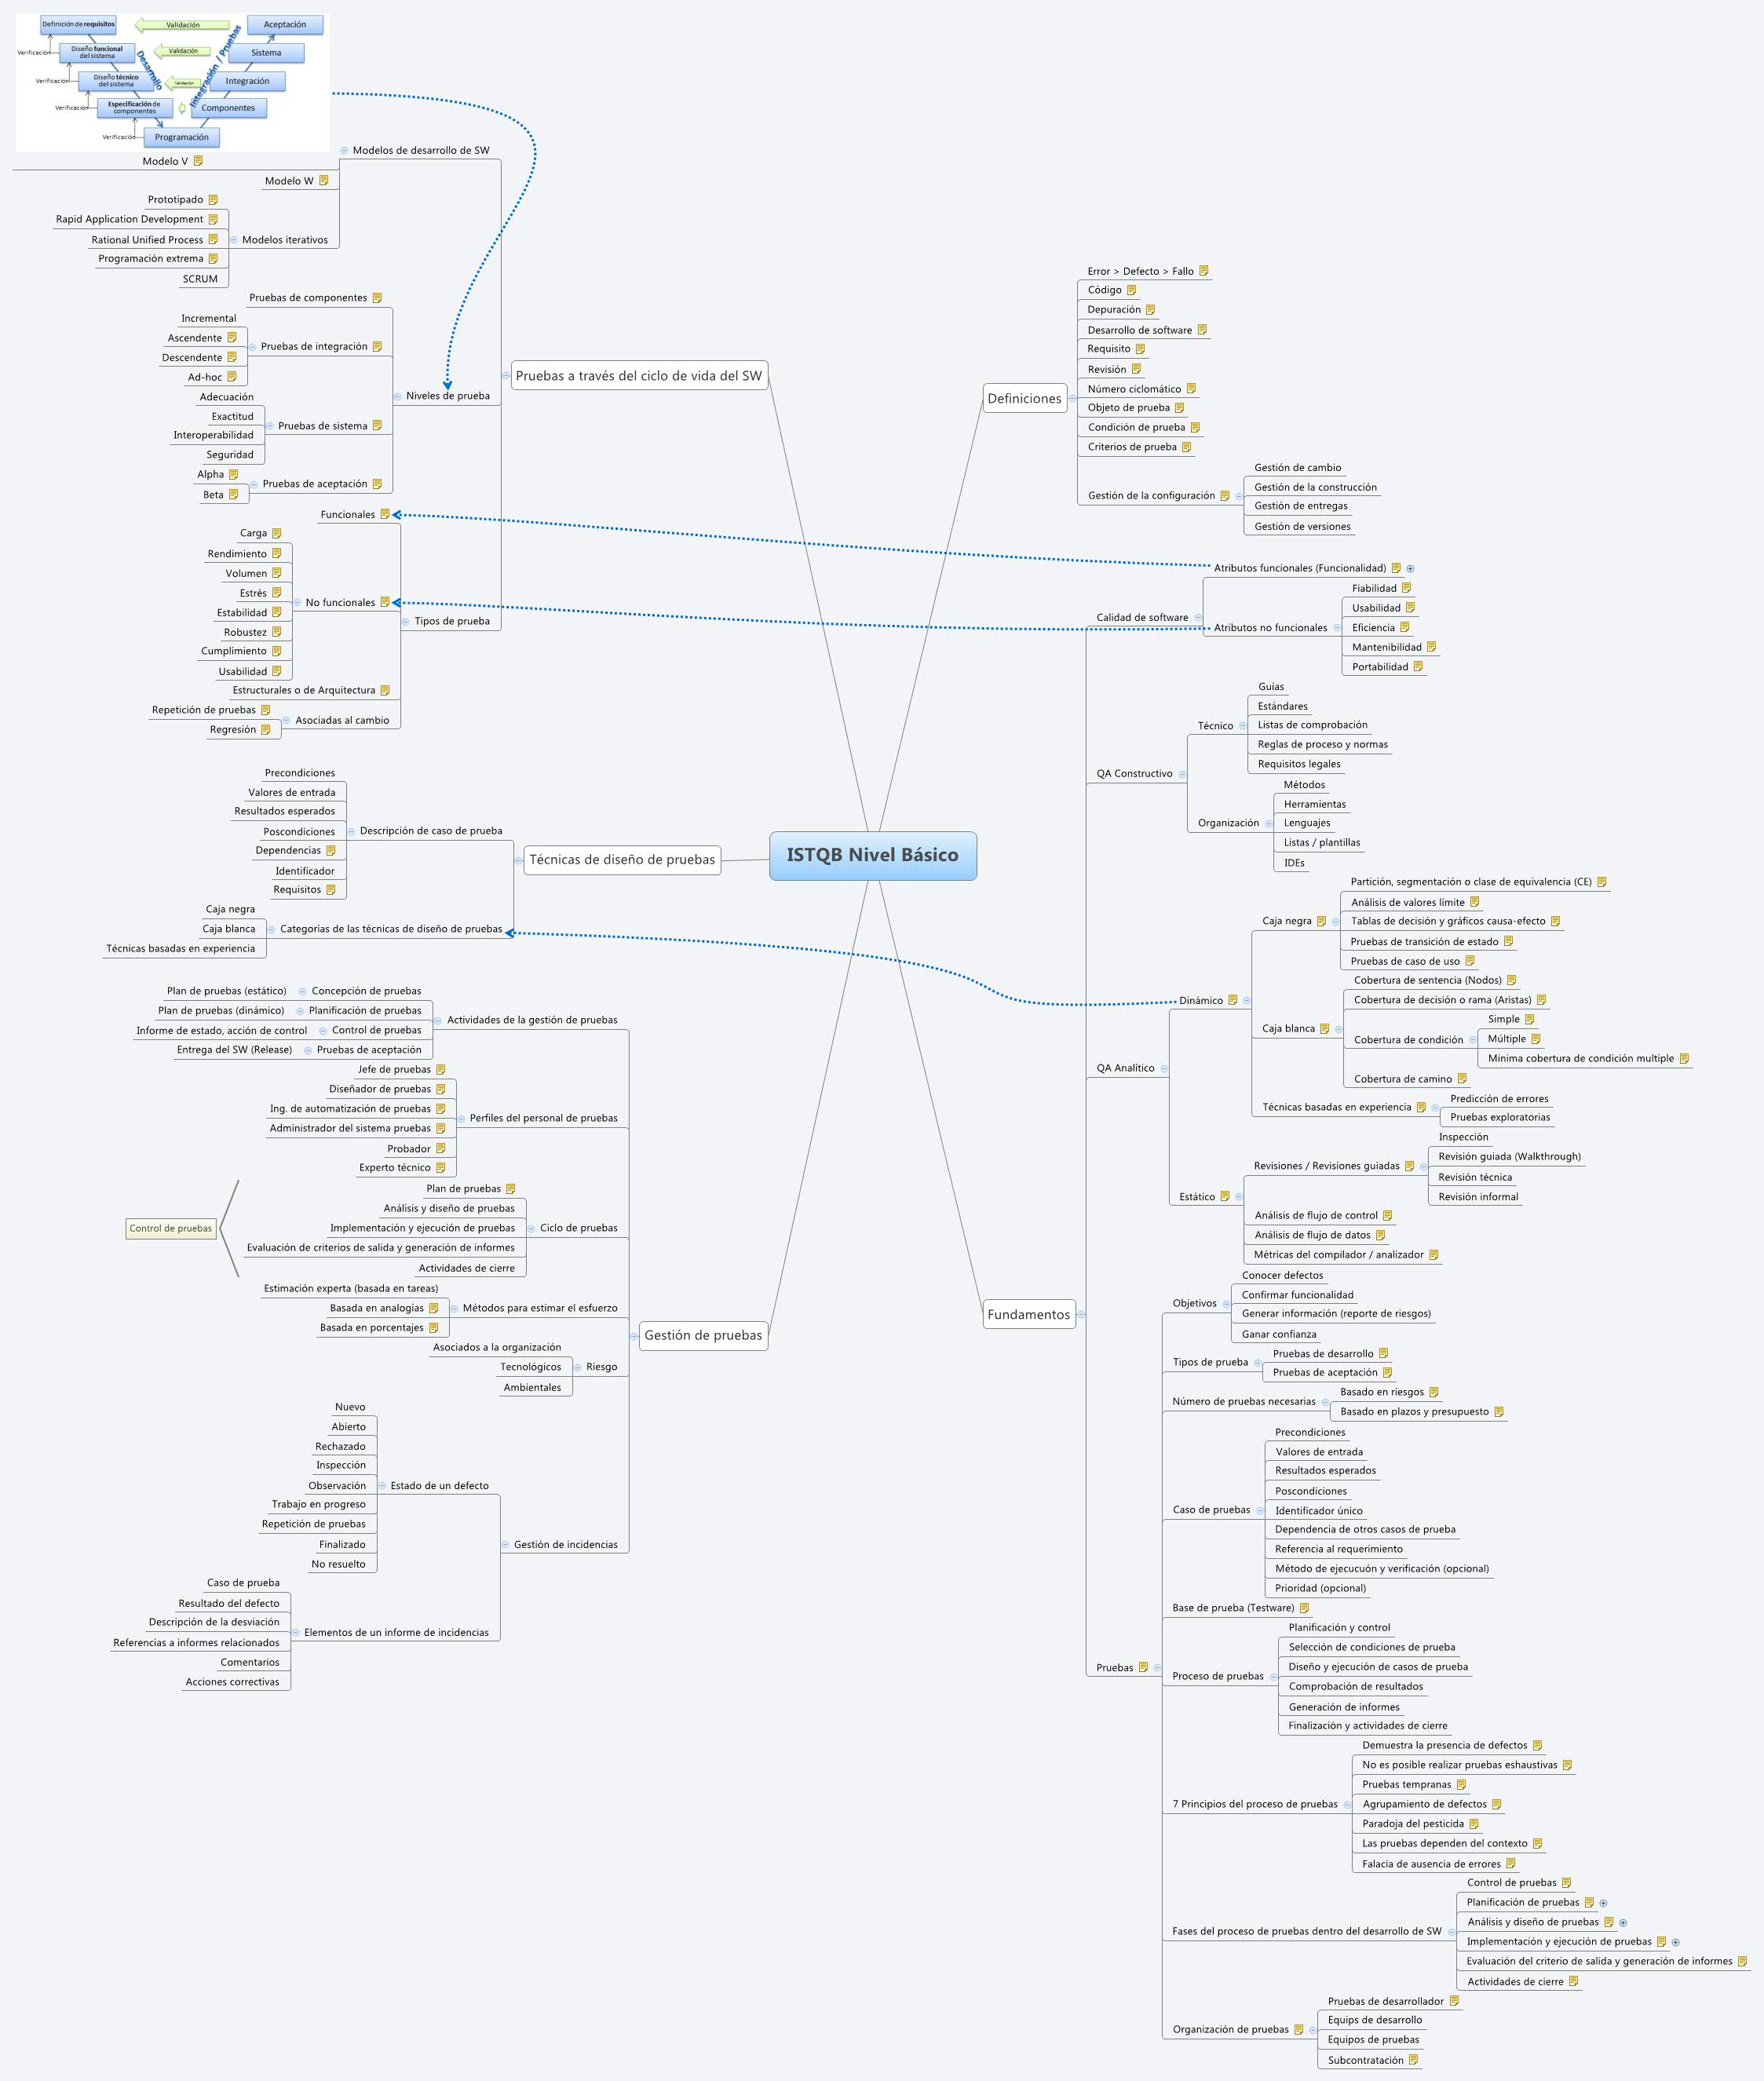 ISTQB Nivel Básico -- XMind Online Library